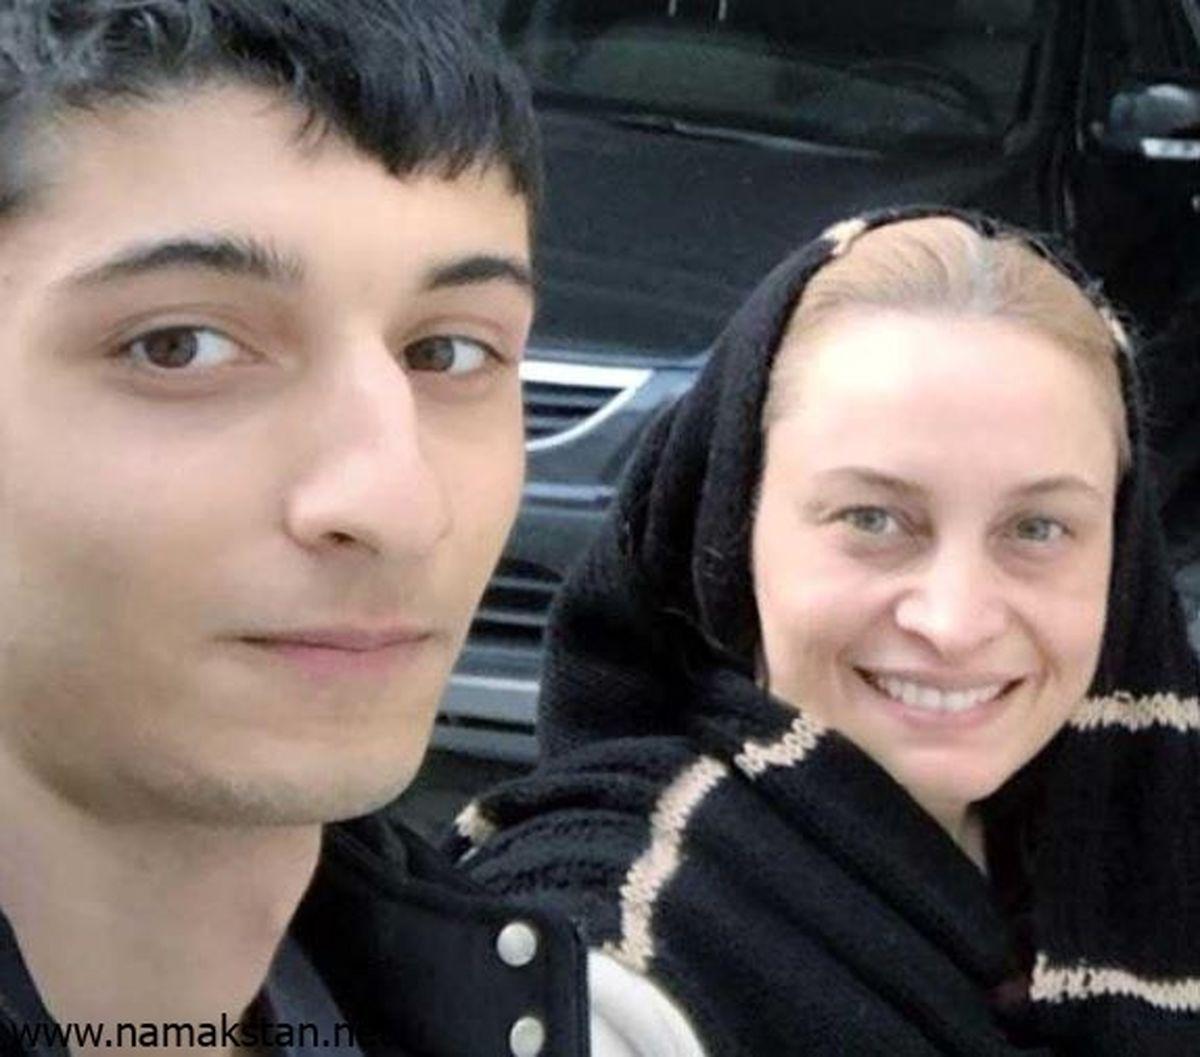 عکس باورنکردنی از مریم کاویانی در کنار پسربزرگش!